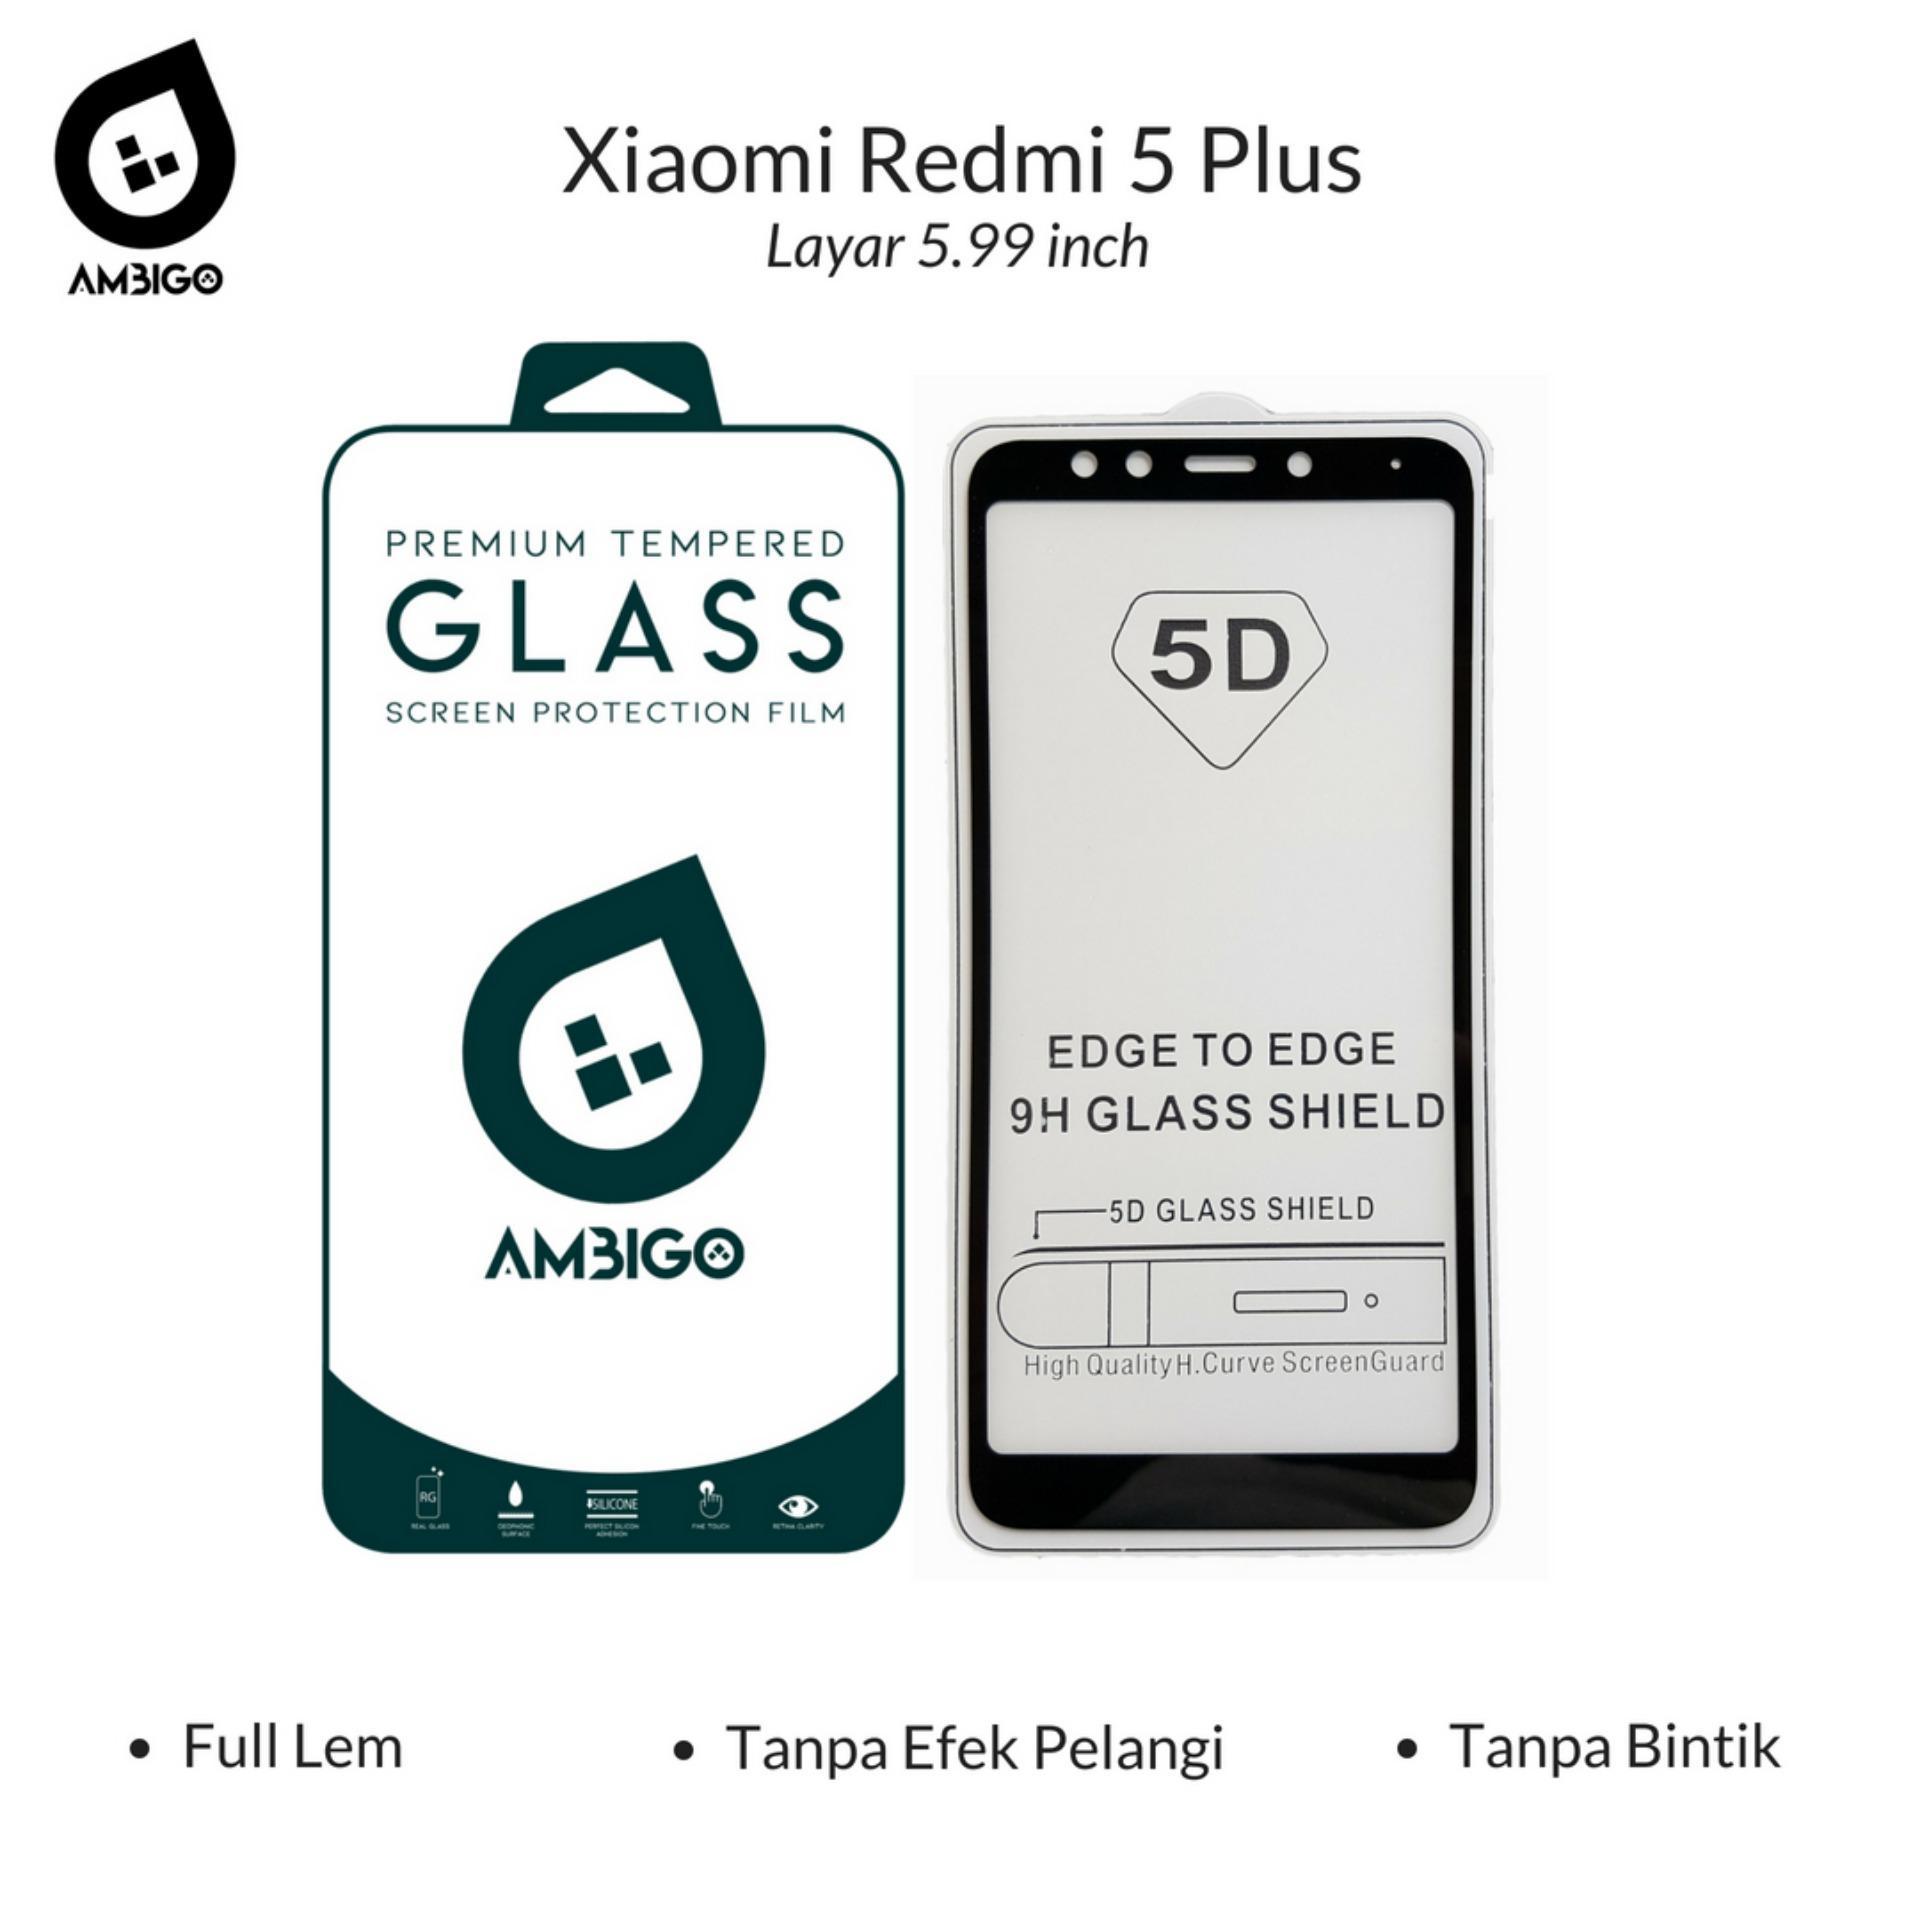 Ambigo 5D Tempered Glass Screen Protector Xiaomi Redmi 5 Plus ( 5.99 inch ) Full Cover